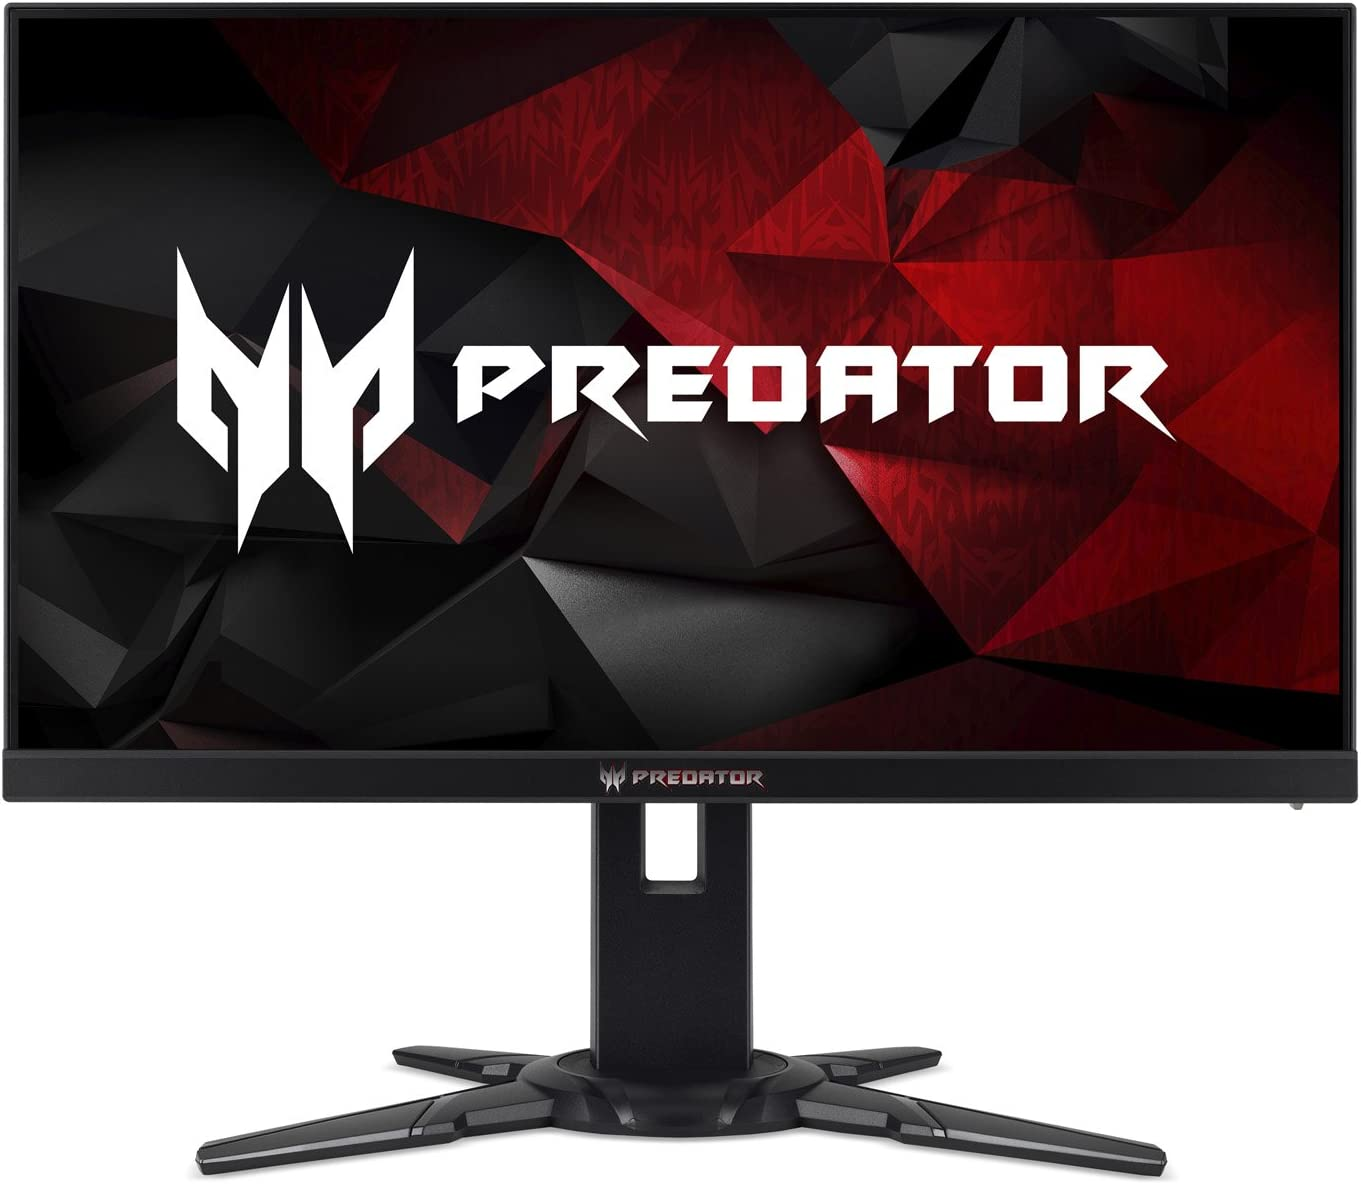 Acer Predator XB252Q Bmiprz 24.5-Inch Full HD (1920x1080) NVIDIA G-Sync Monitor (Display Port & HDMI Port, 240Hz)